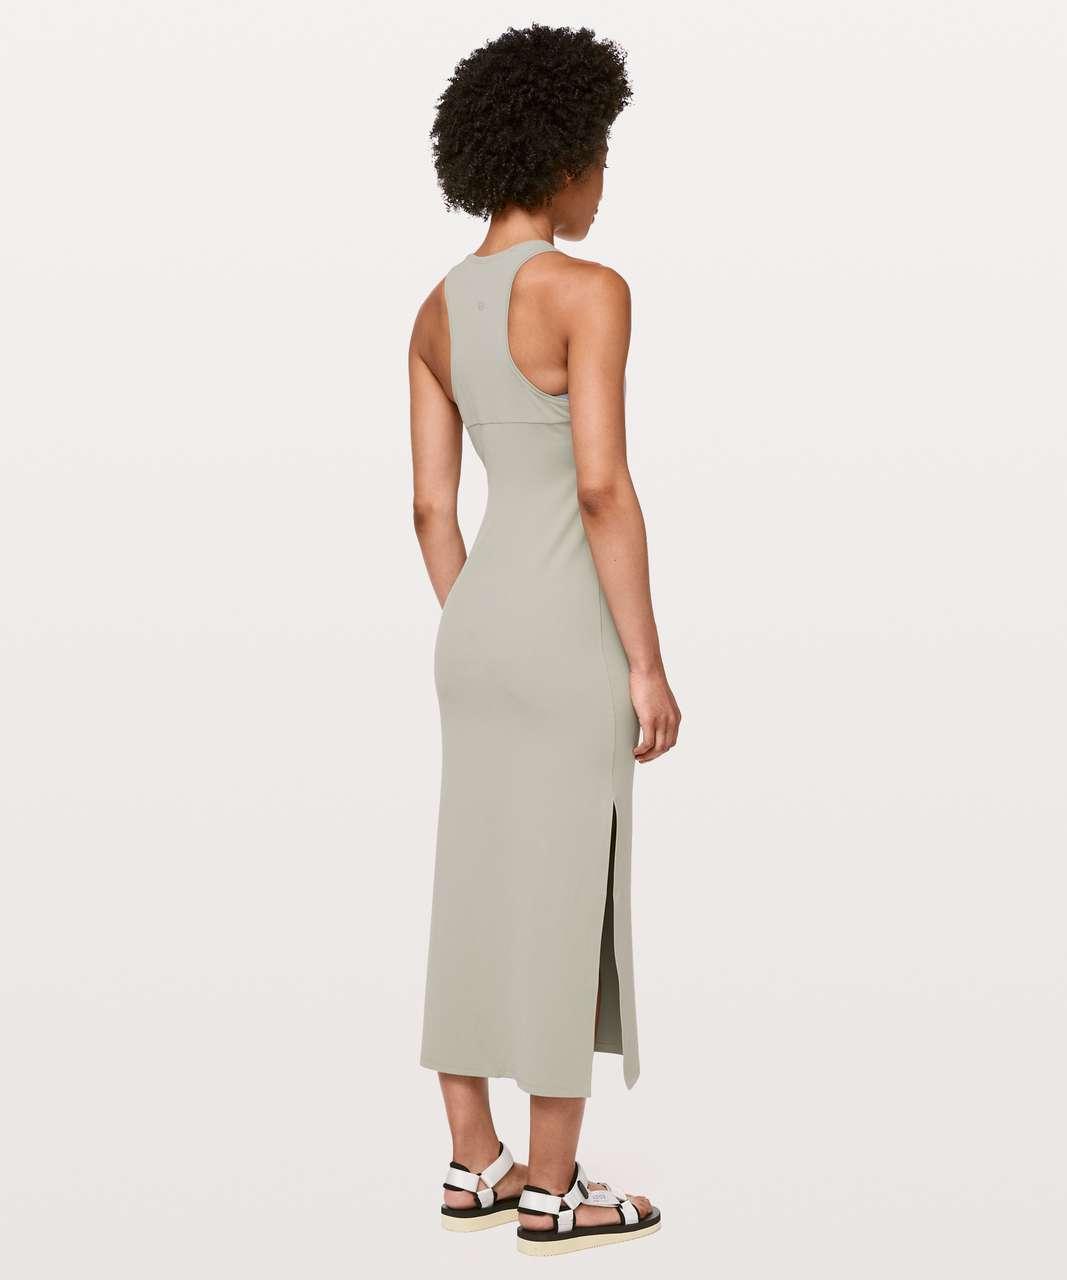 Lululemon Get Going Dress - Riverstone